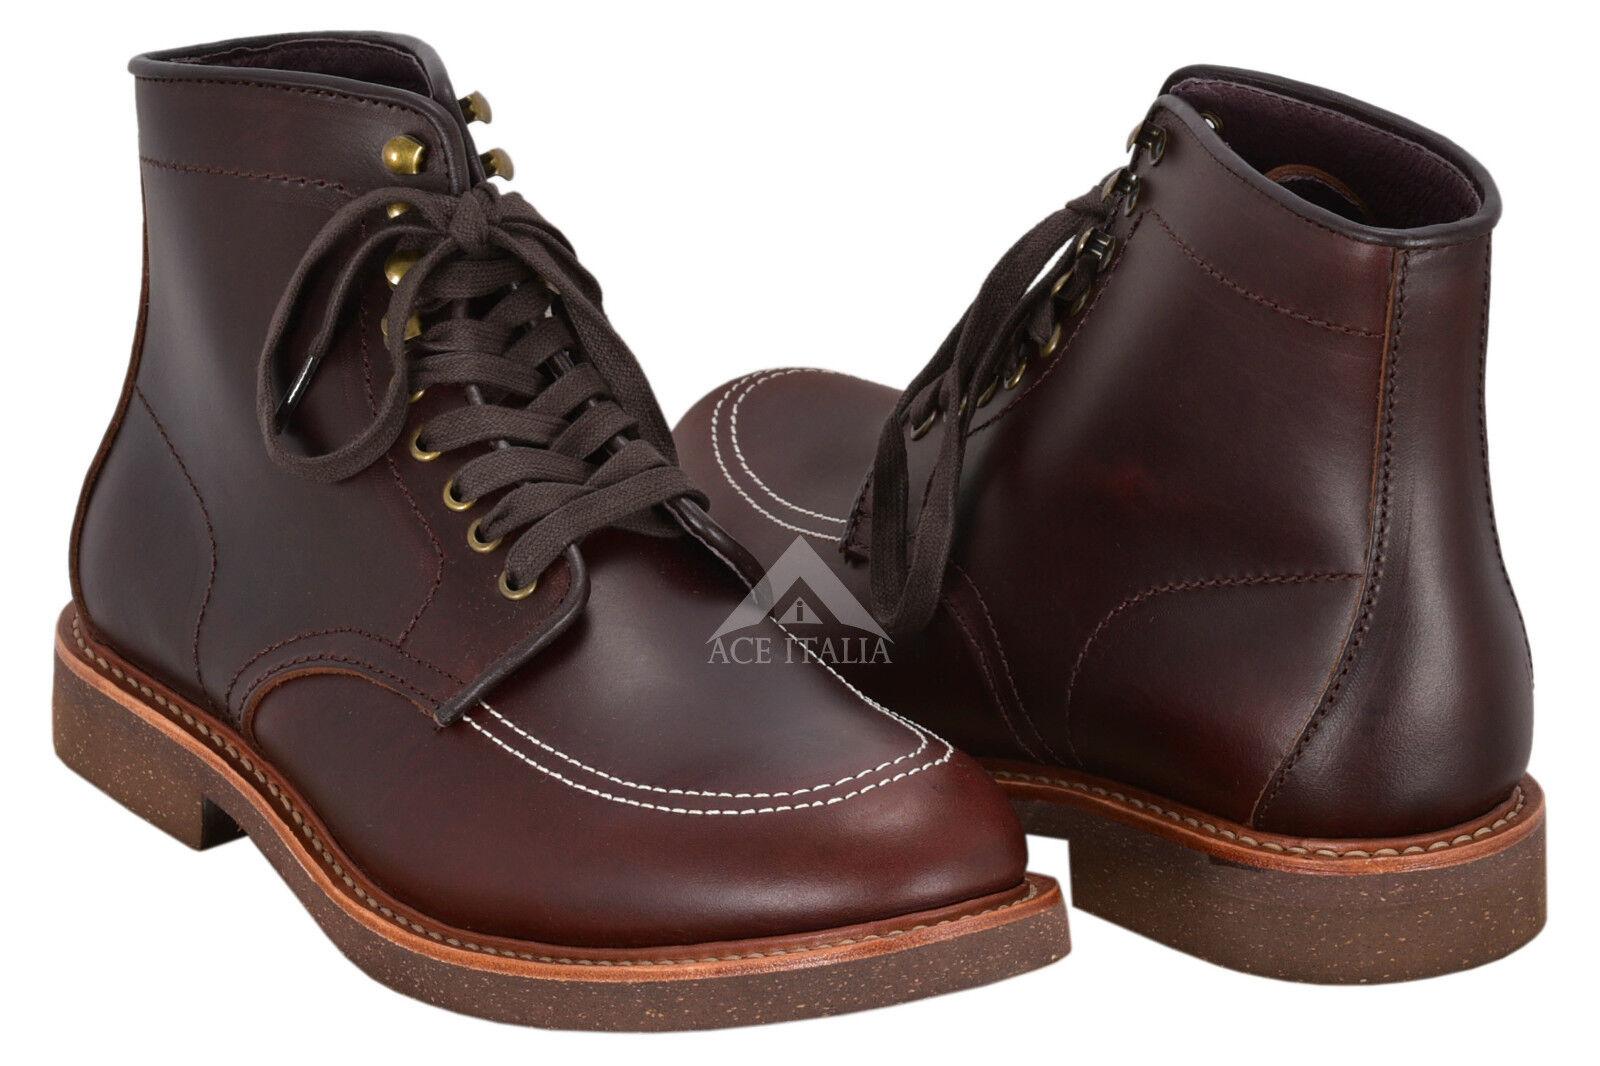 Indy Stiefel Indiana Jones Movie Inspirot Real Leather Dark braun High Ankle Stiefel